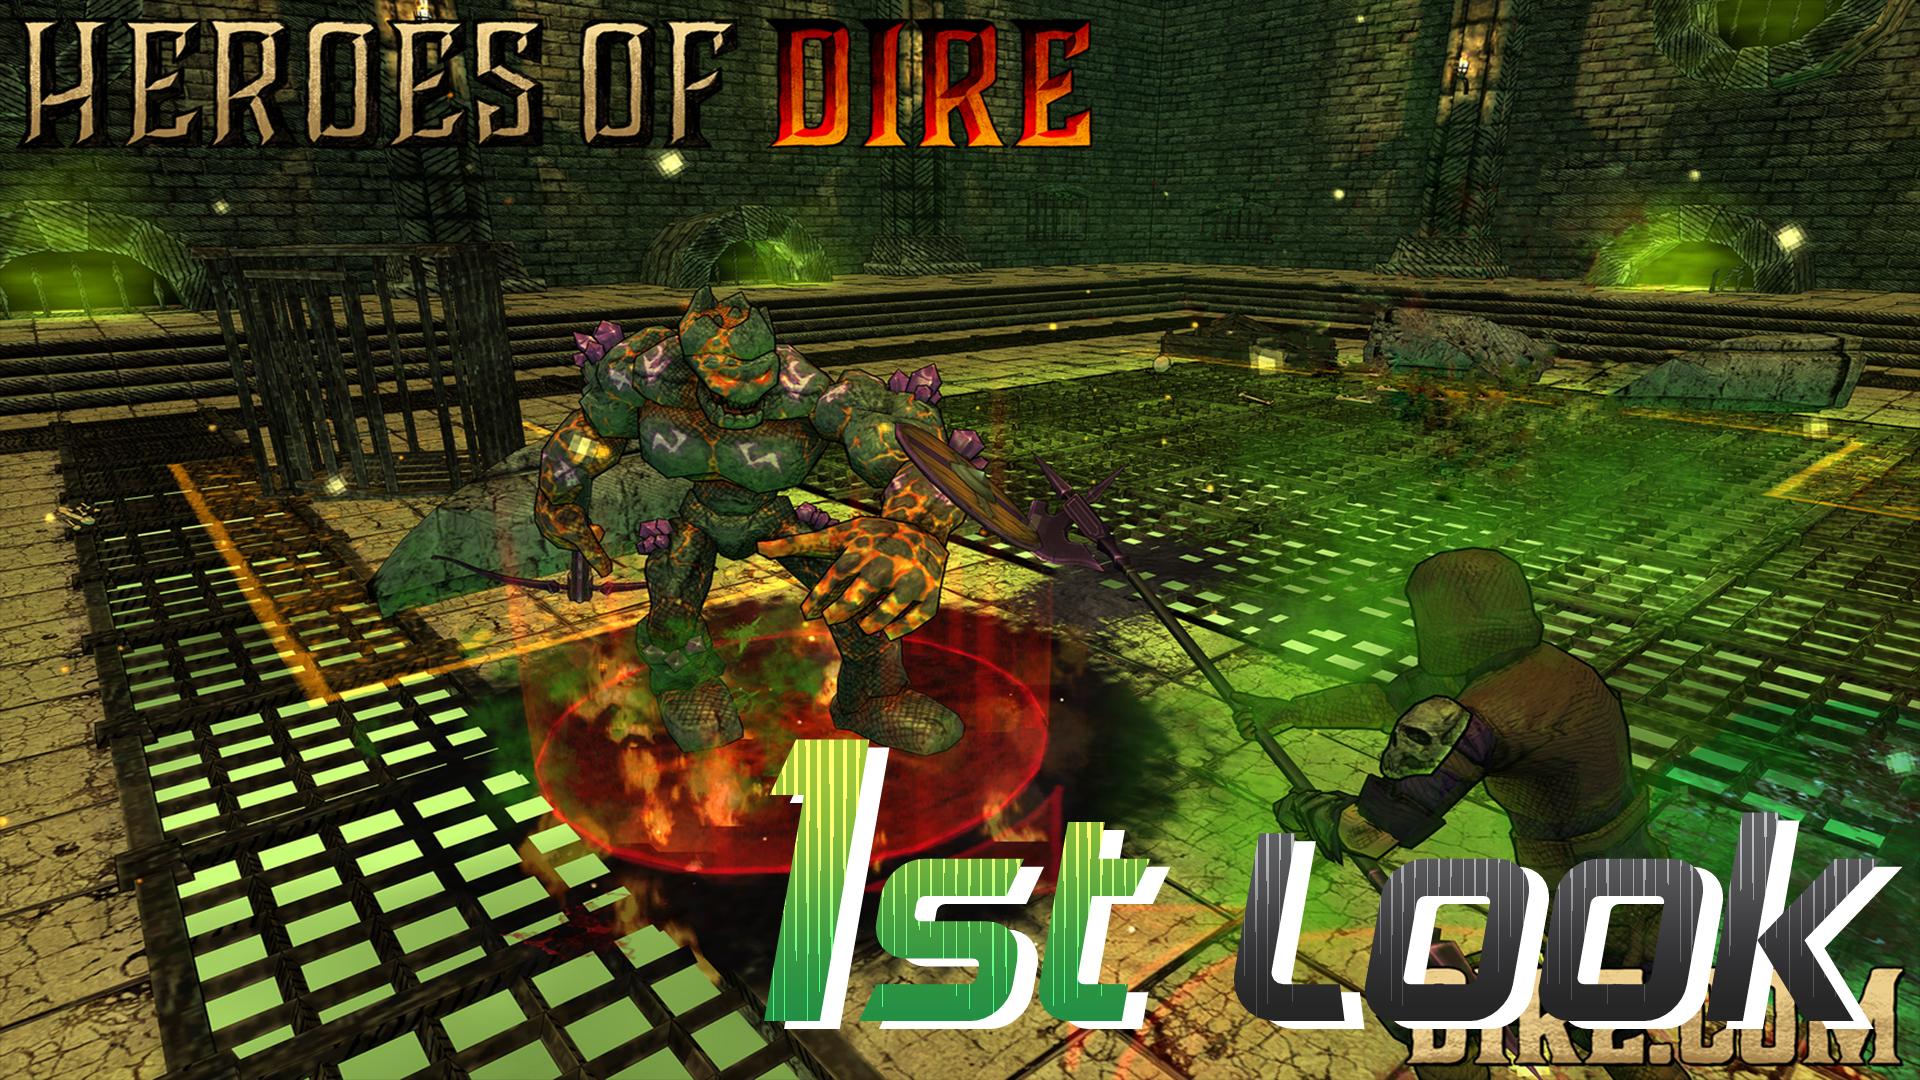 Heroes of Dire - First Look